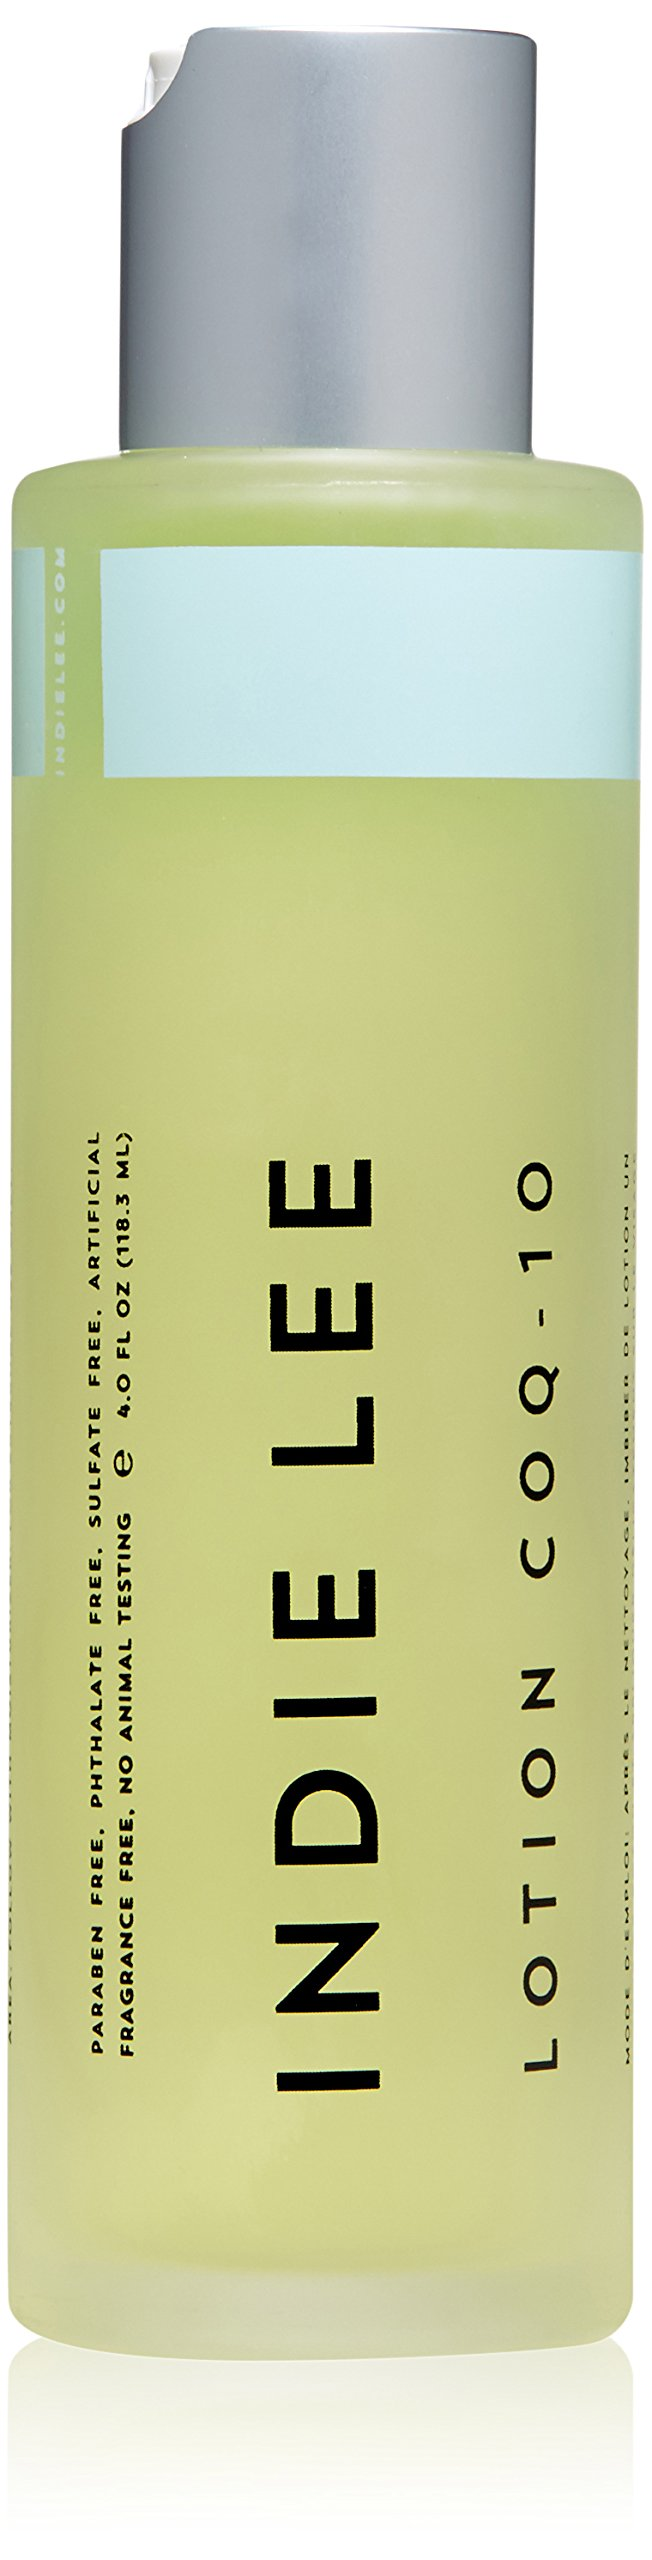 Indie Lee CoQ-10 Toner, 4 fl. oz.